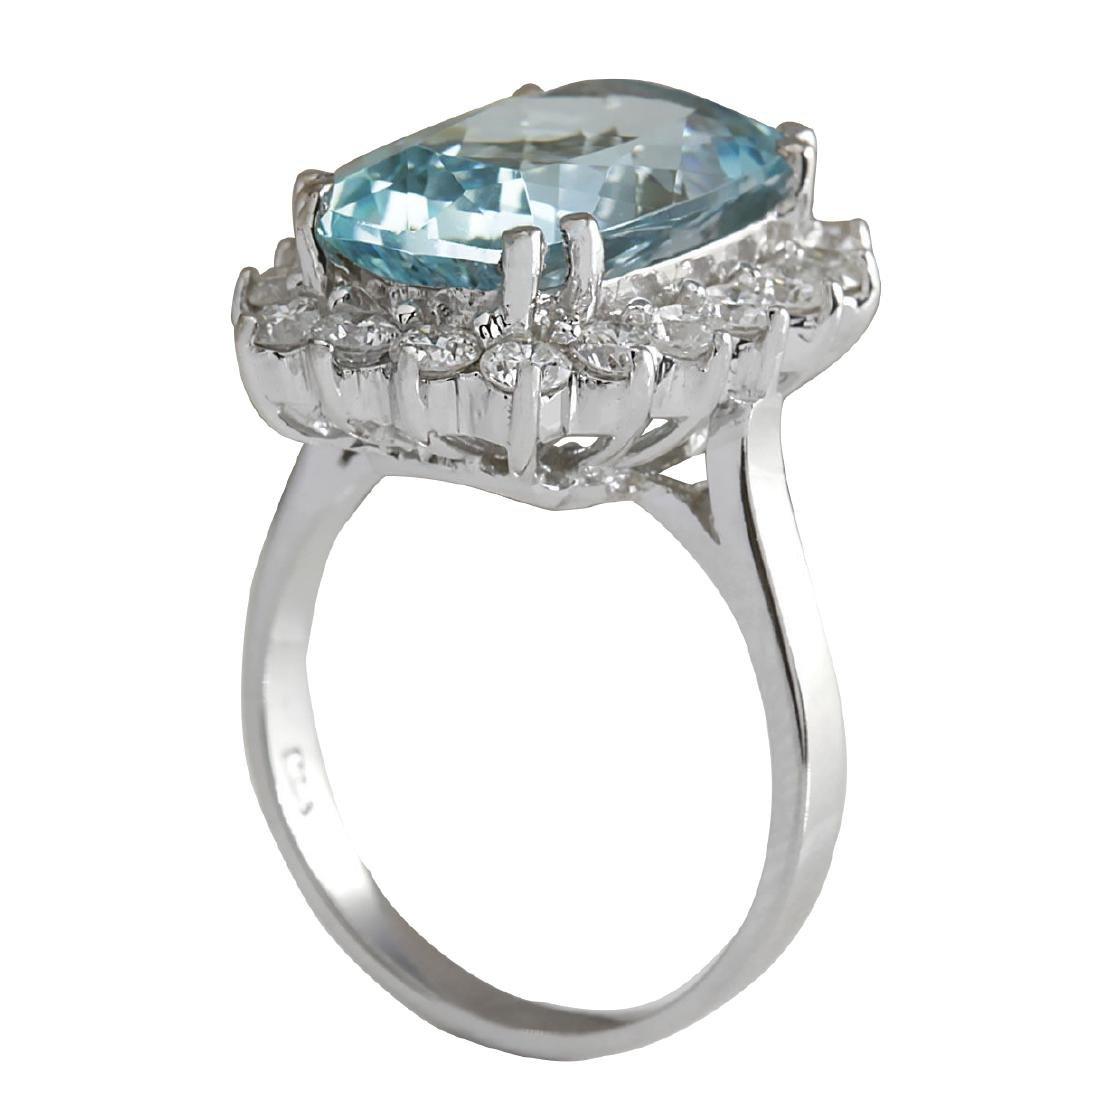 7.00CTW Natural Aquamarine And Diamond Ring In 18K - 3